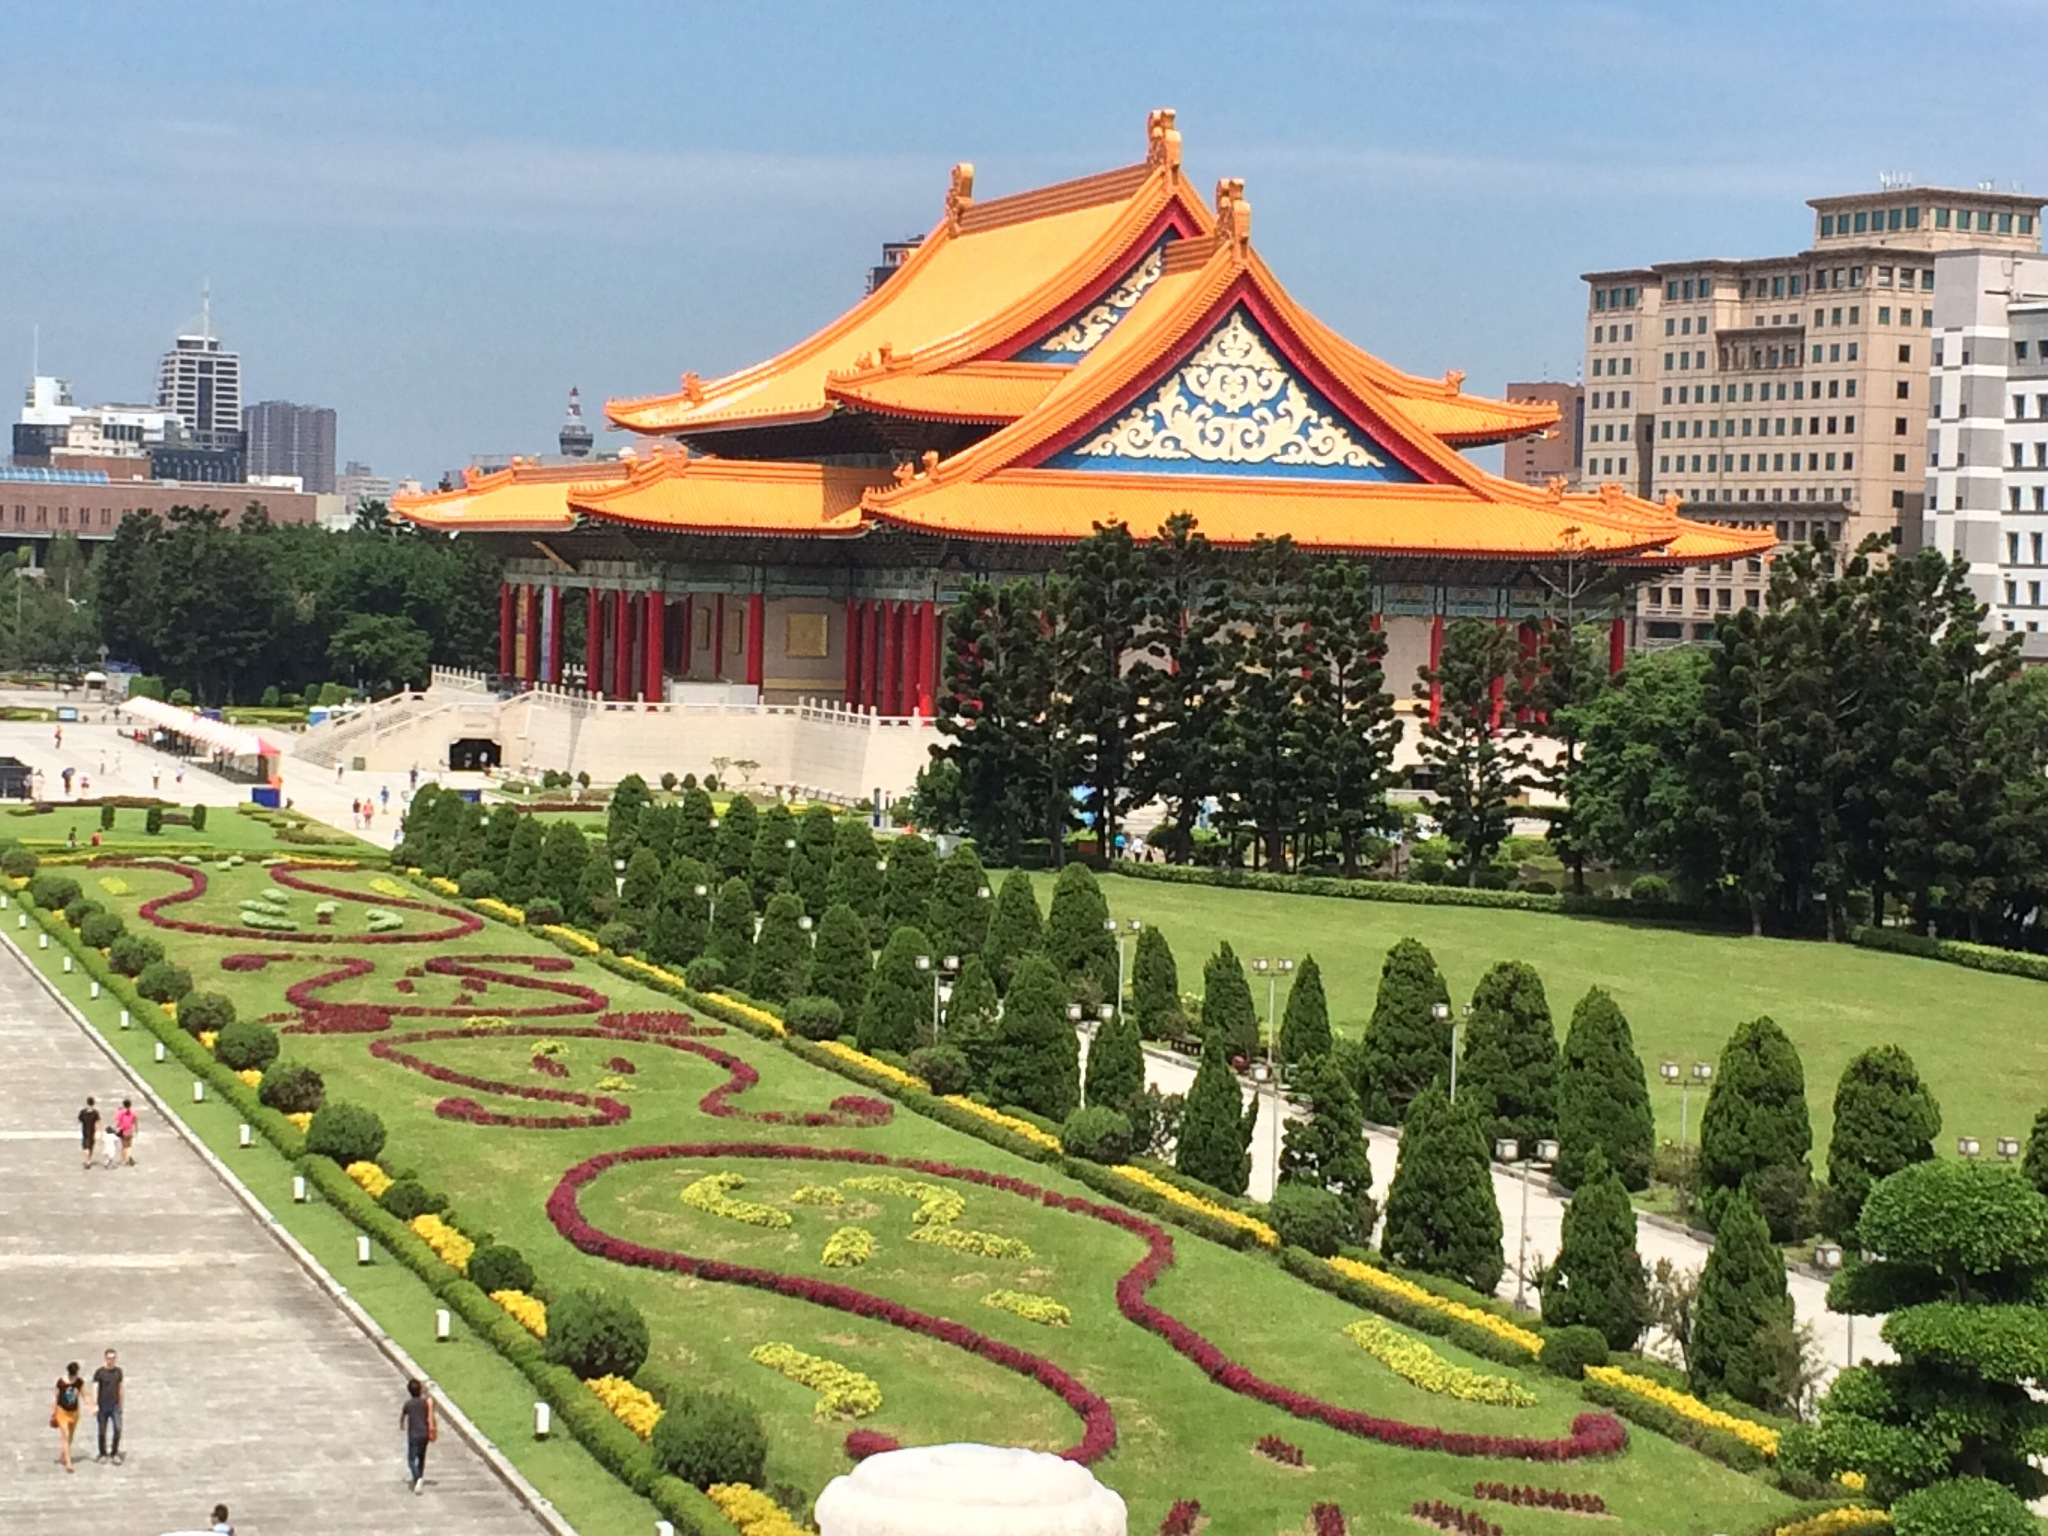 Chiang Kai Shek Memorial Park and Gardens by Veronica Brown